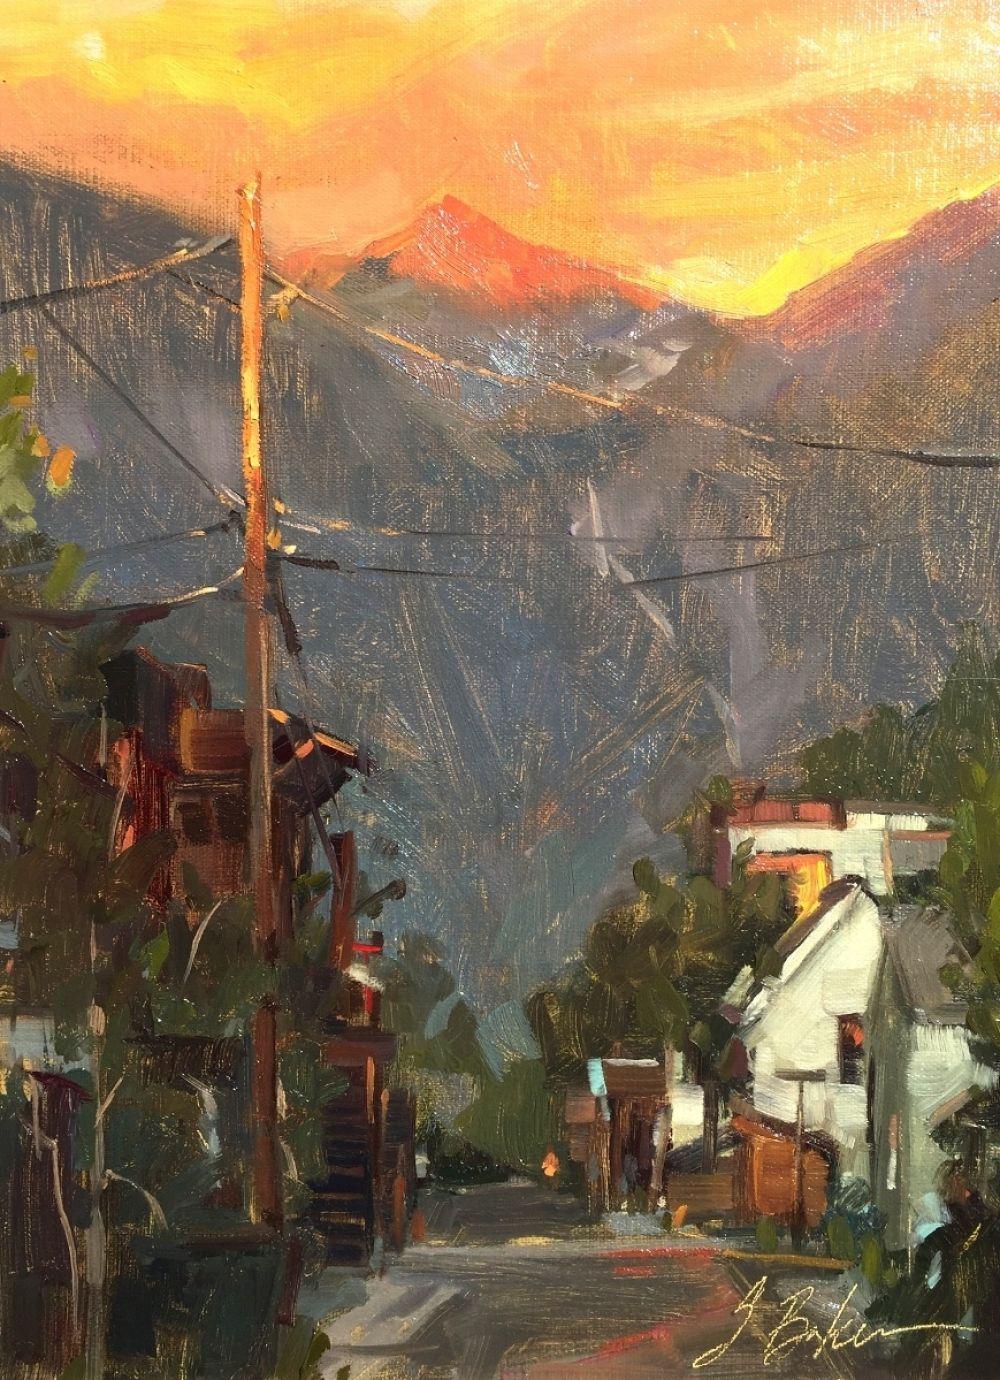 Alpenglow, by artist Suzie Baker paintingcontest